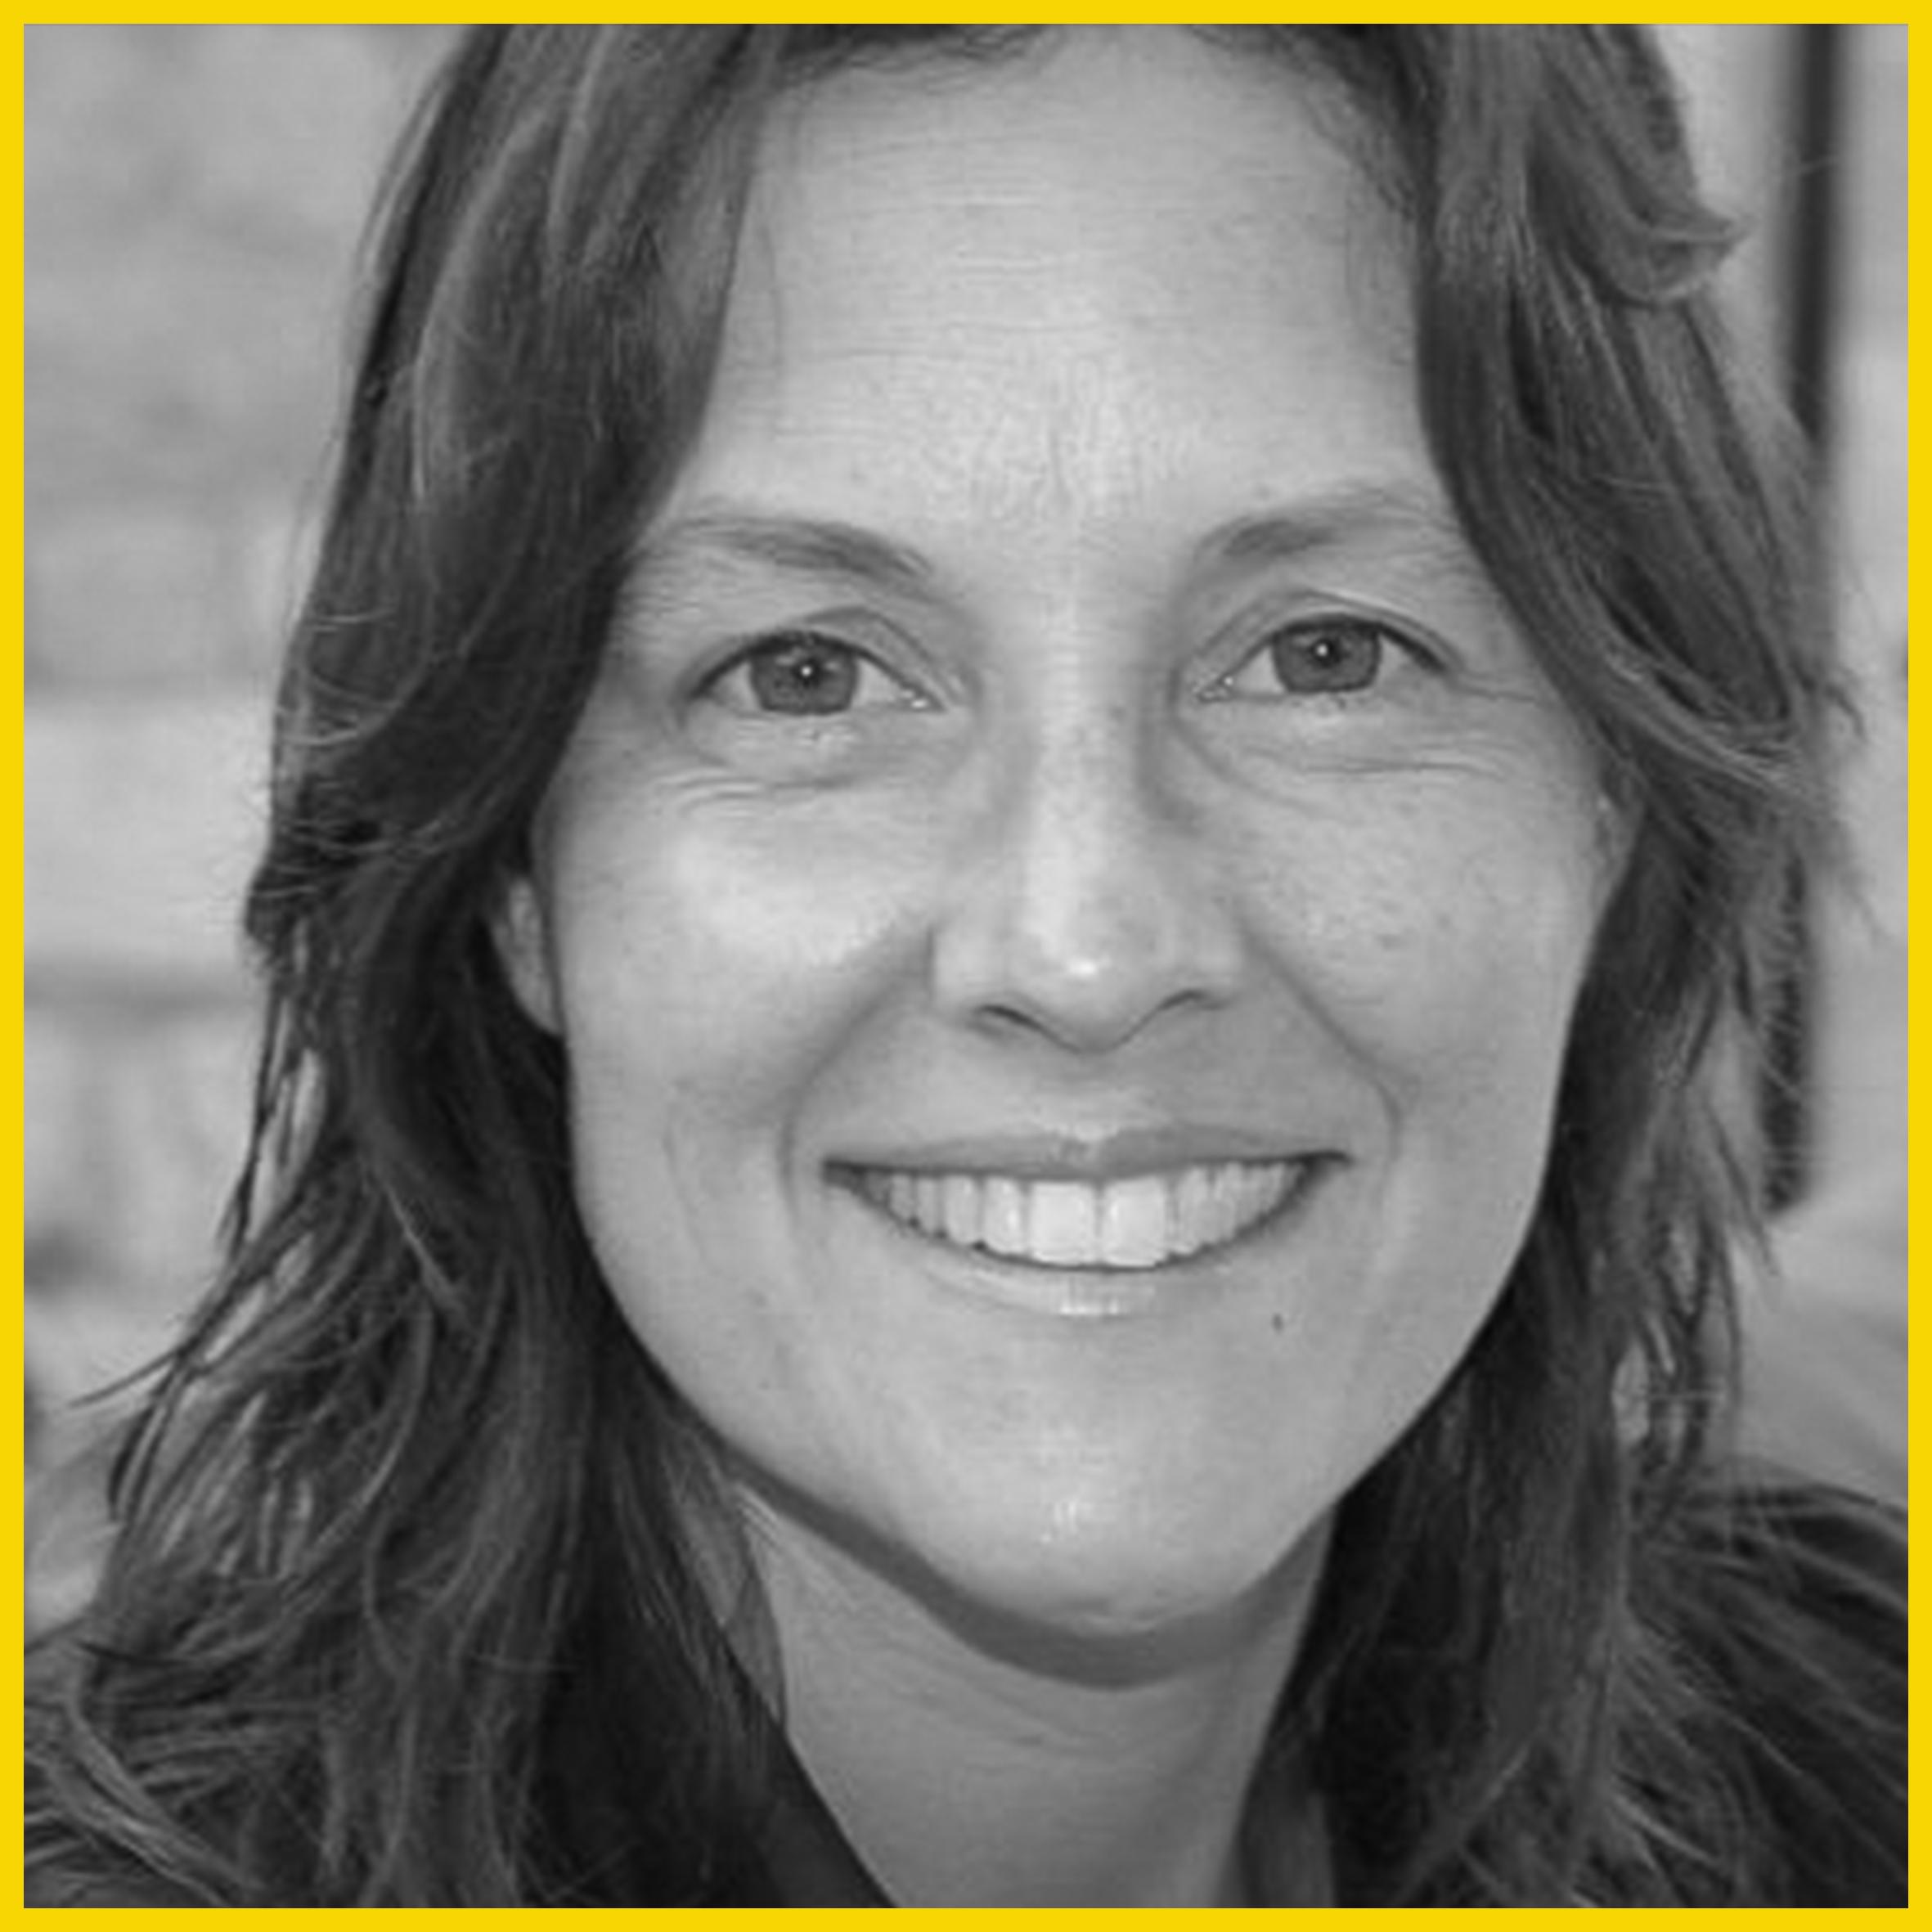 Nathalie La Verge - TMT at Deloitte & Board Member of InspiringFifty